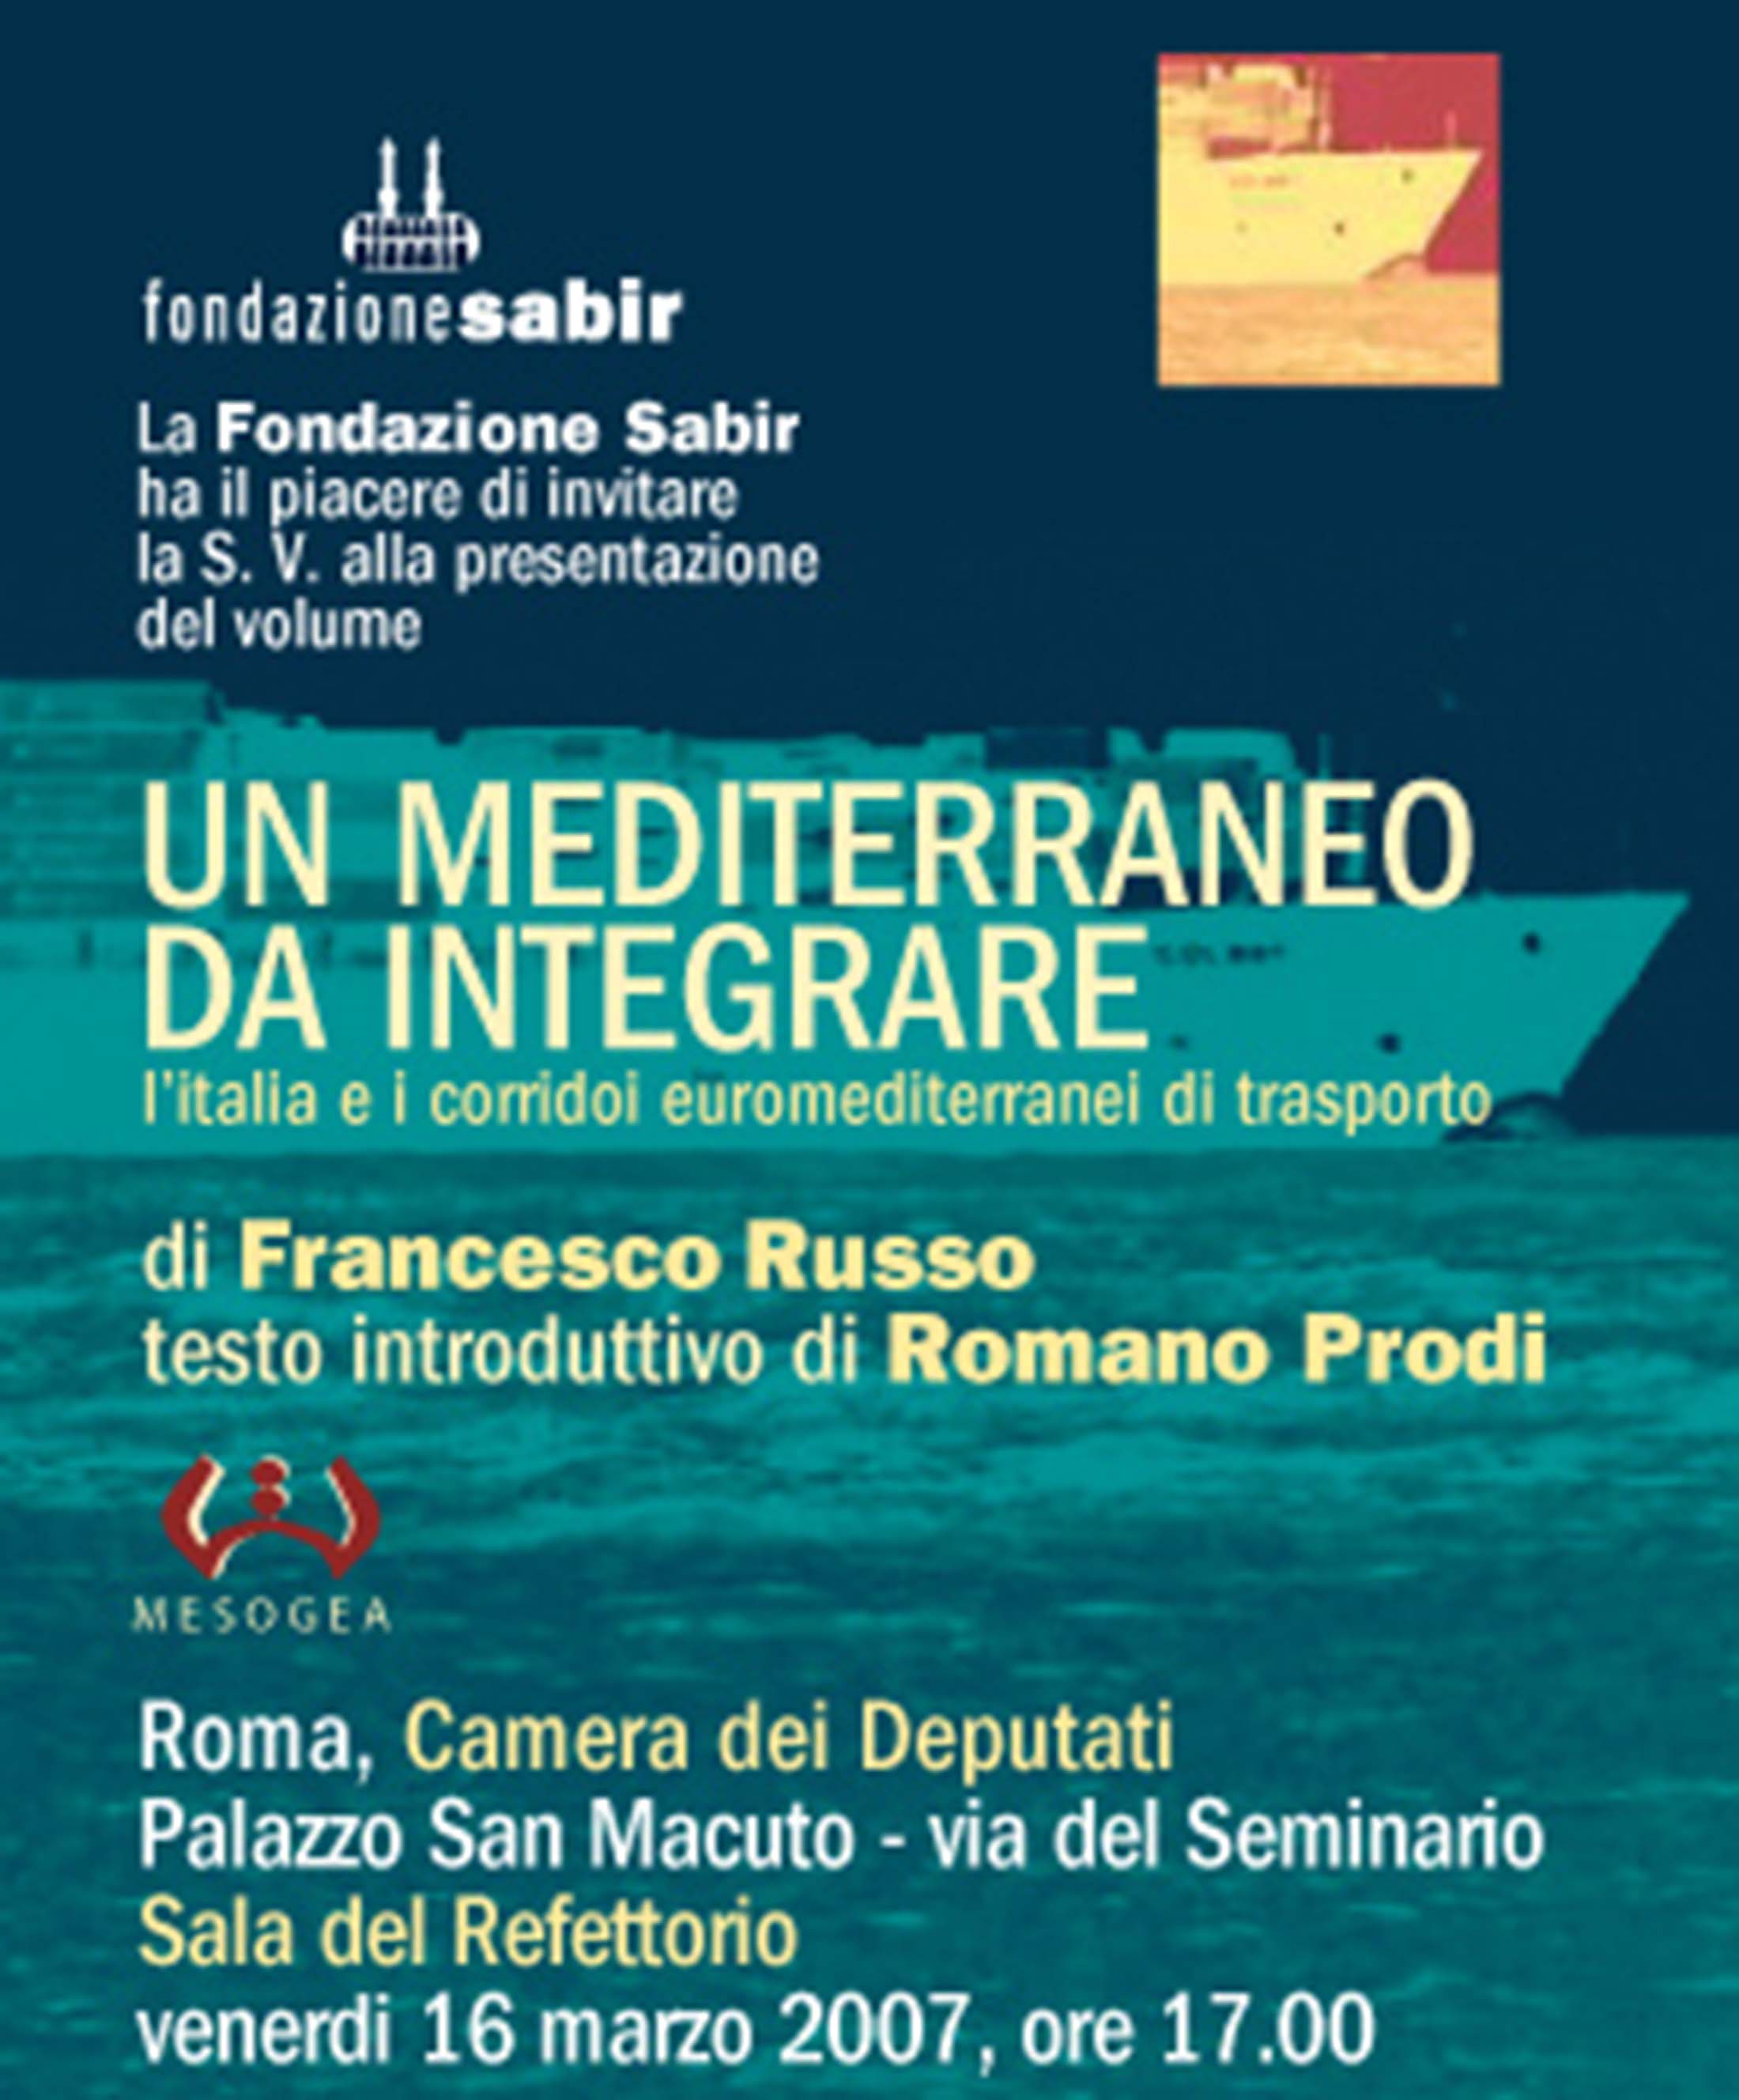 http://www.fondazionesabir.org/wp-content/uploads/2016/11/6a_un-mediterraneo-da-integrare_immag.jpg